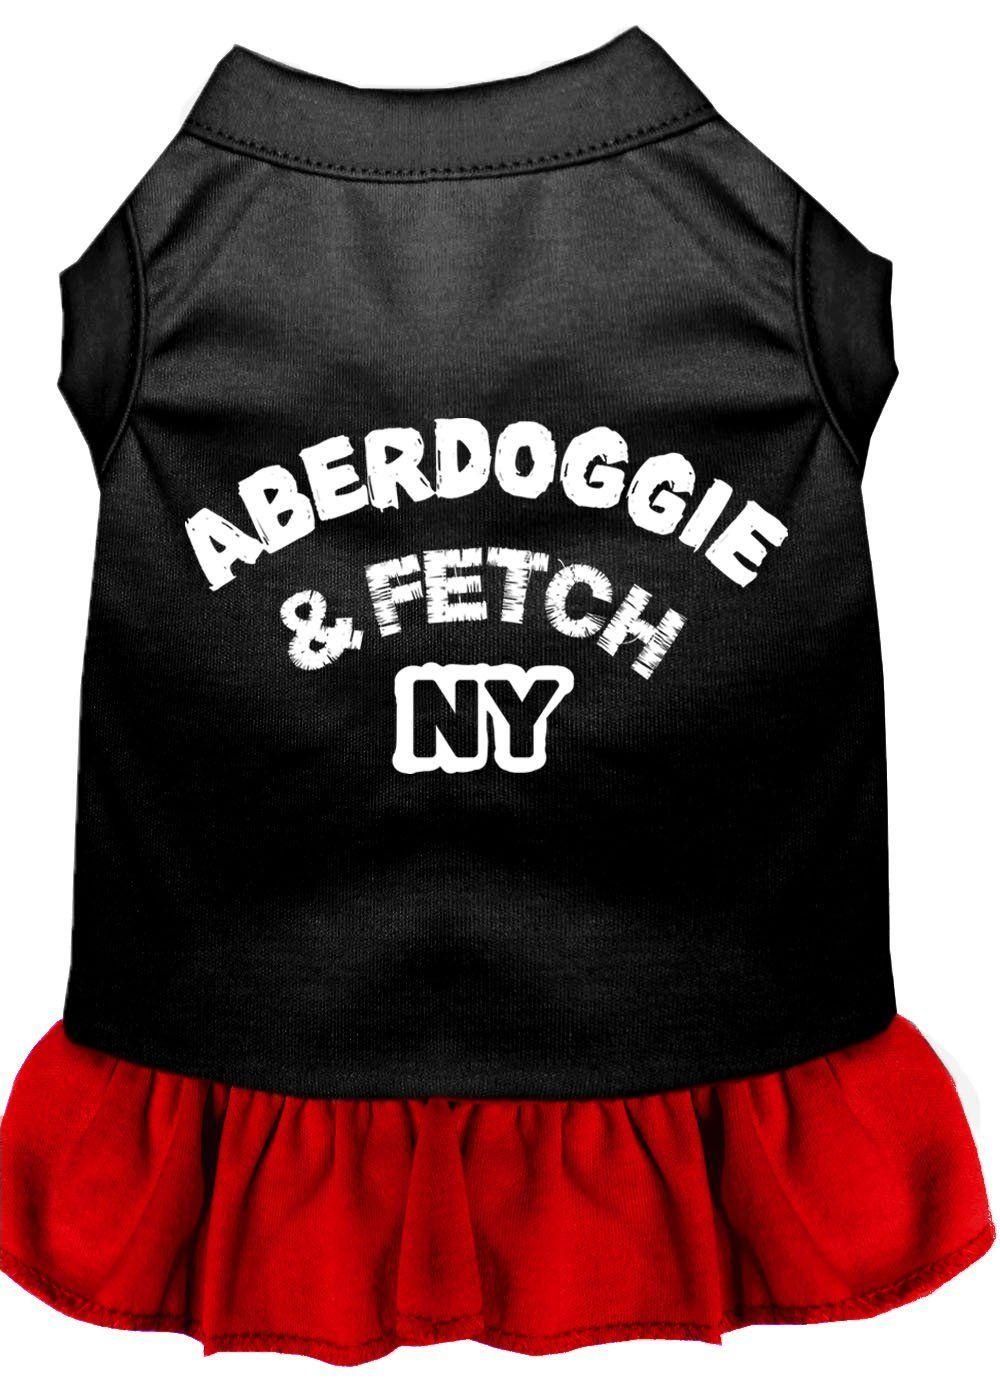 Aberdoggie ny screen print dress black with bright pink bright